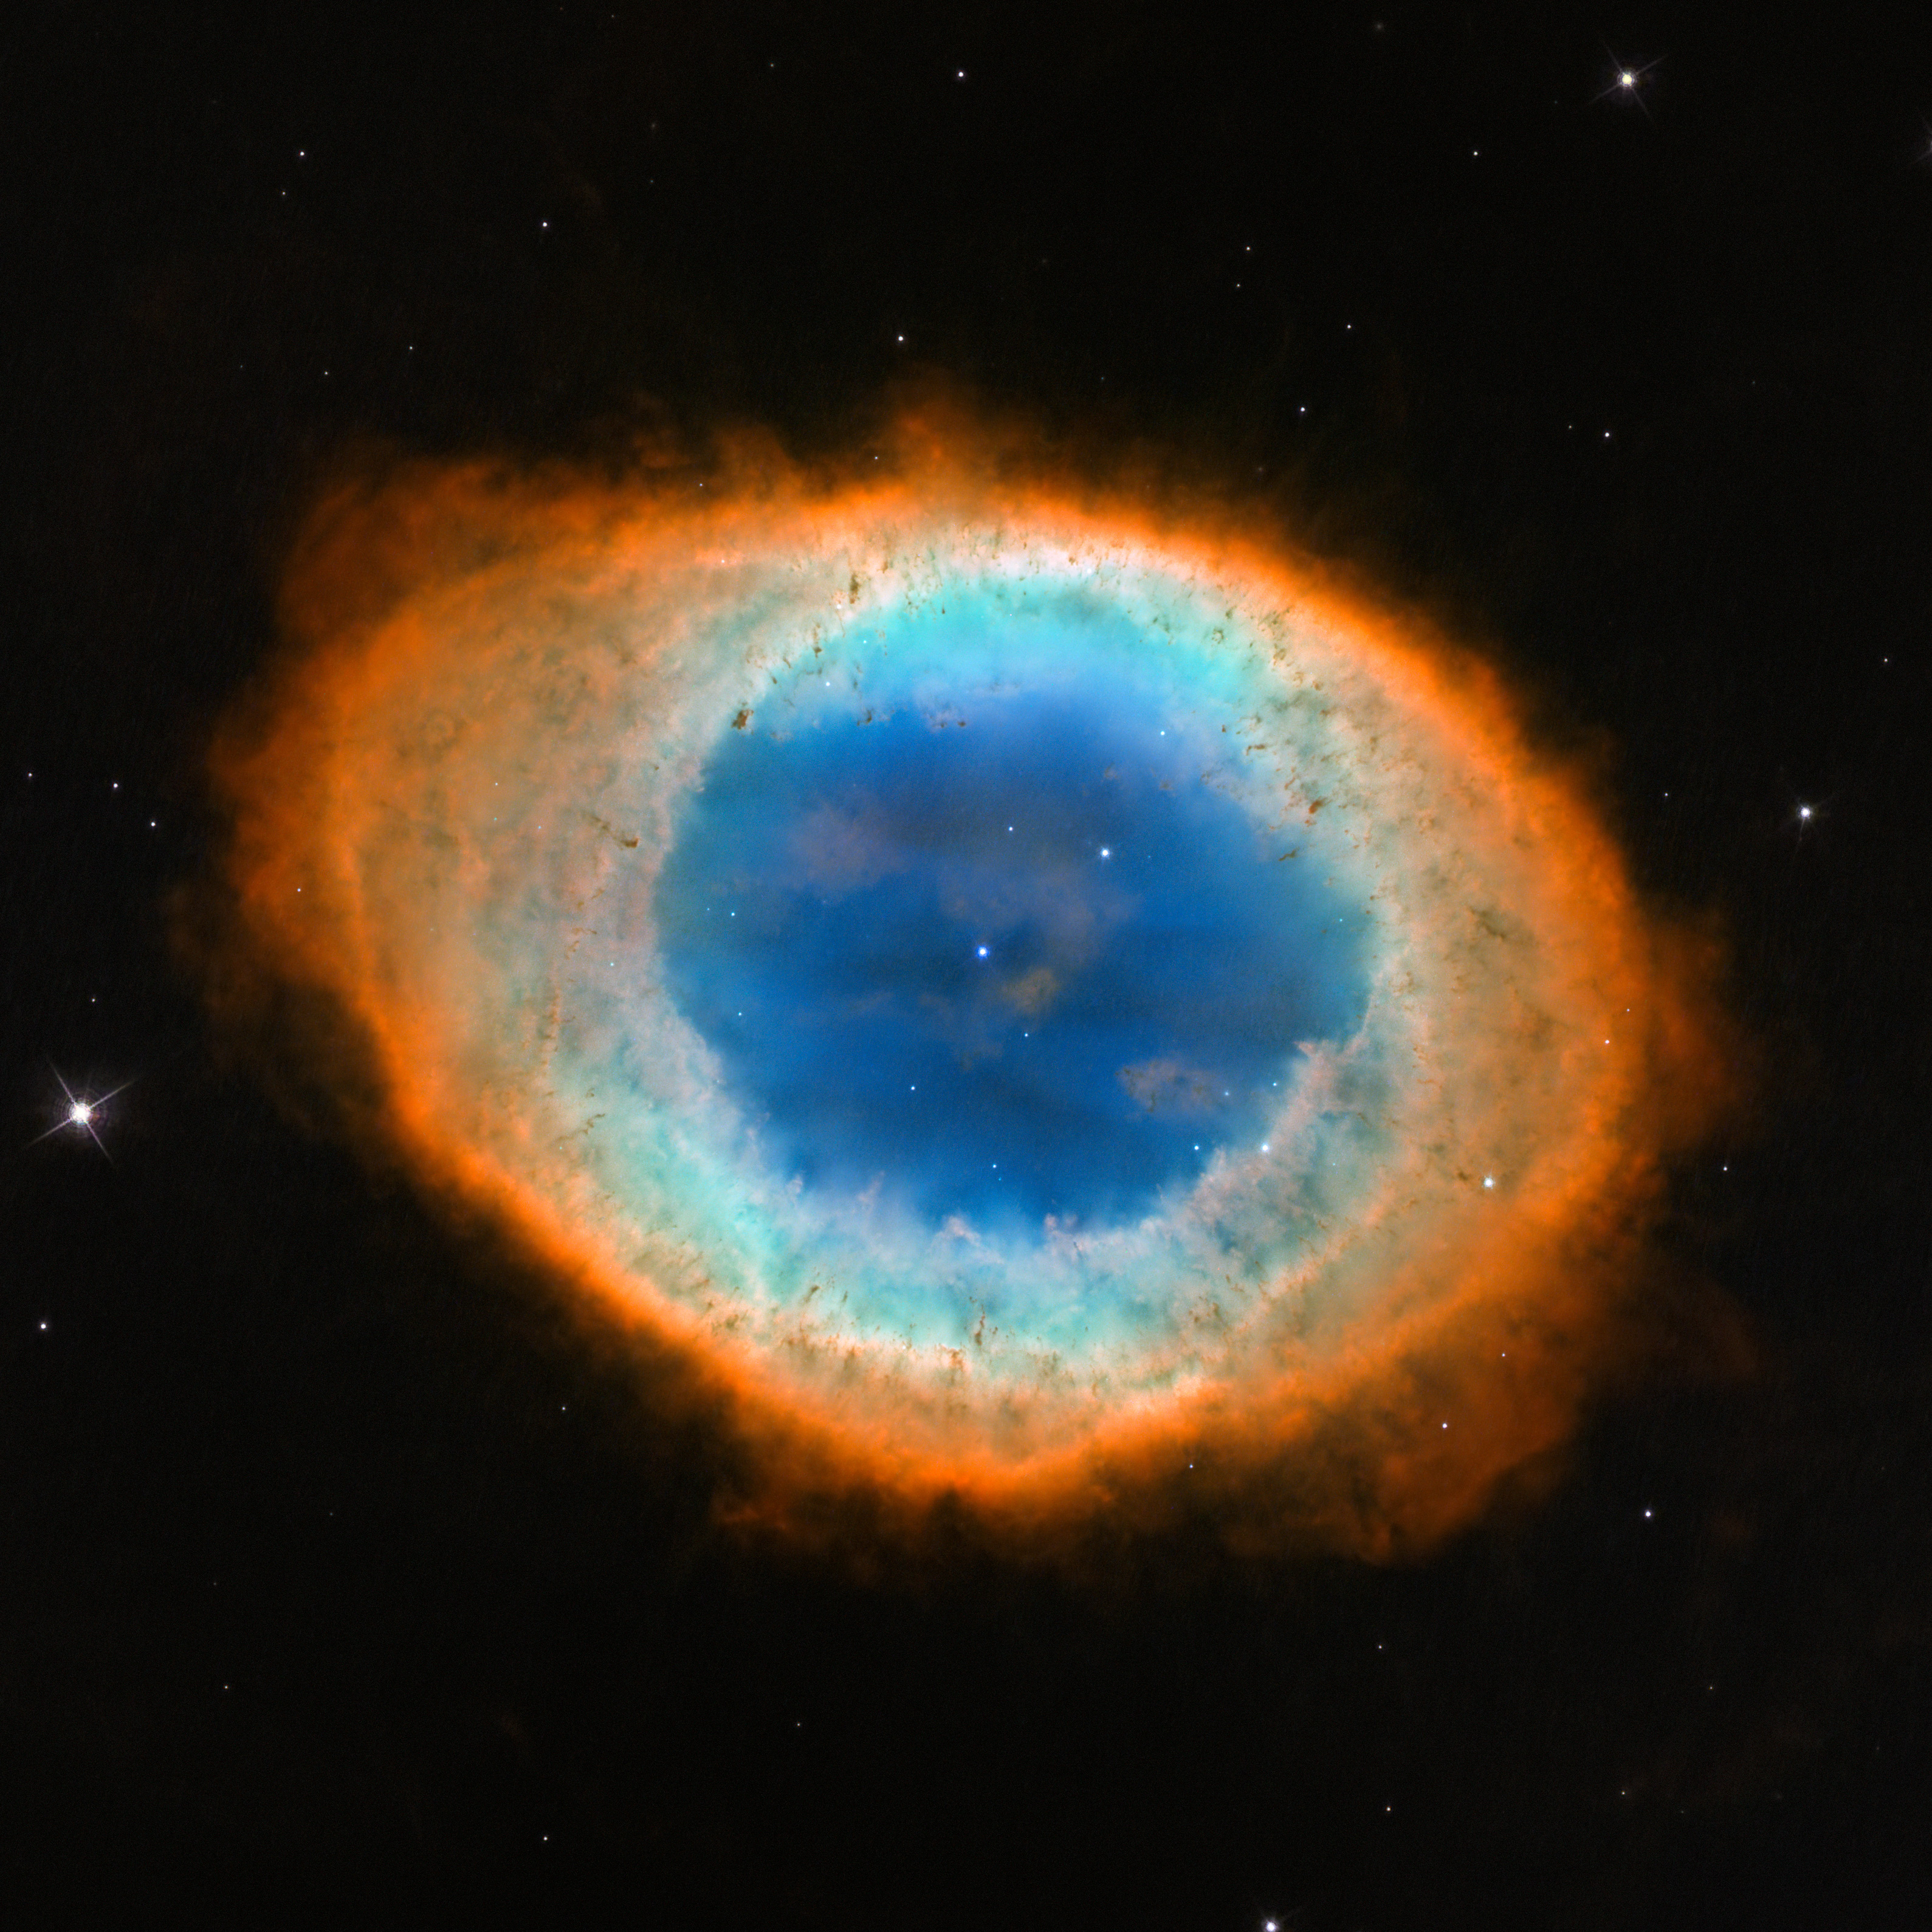 Inaccessible nebulae- a broken exploration dream